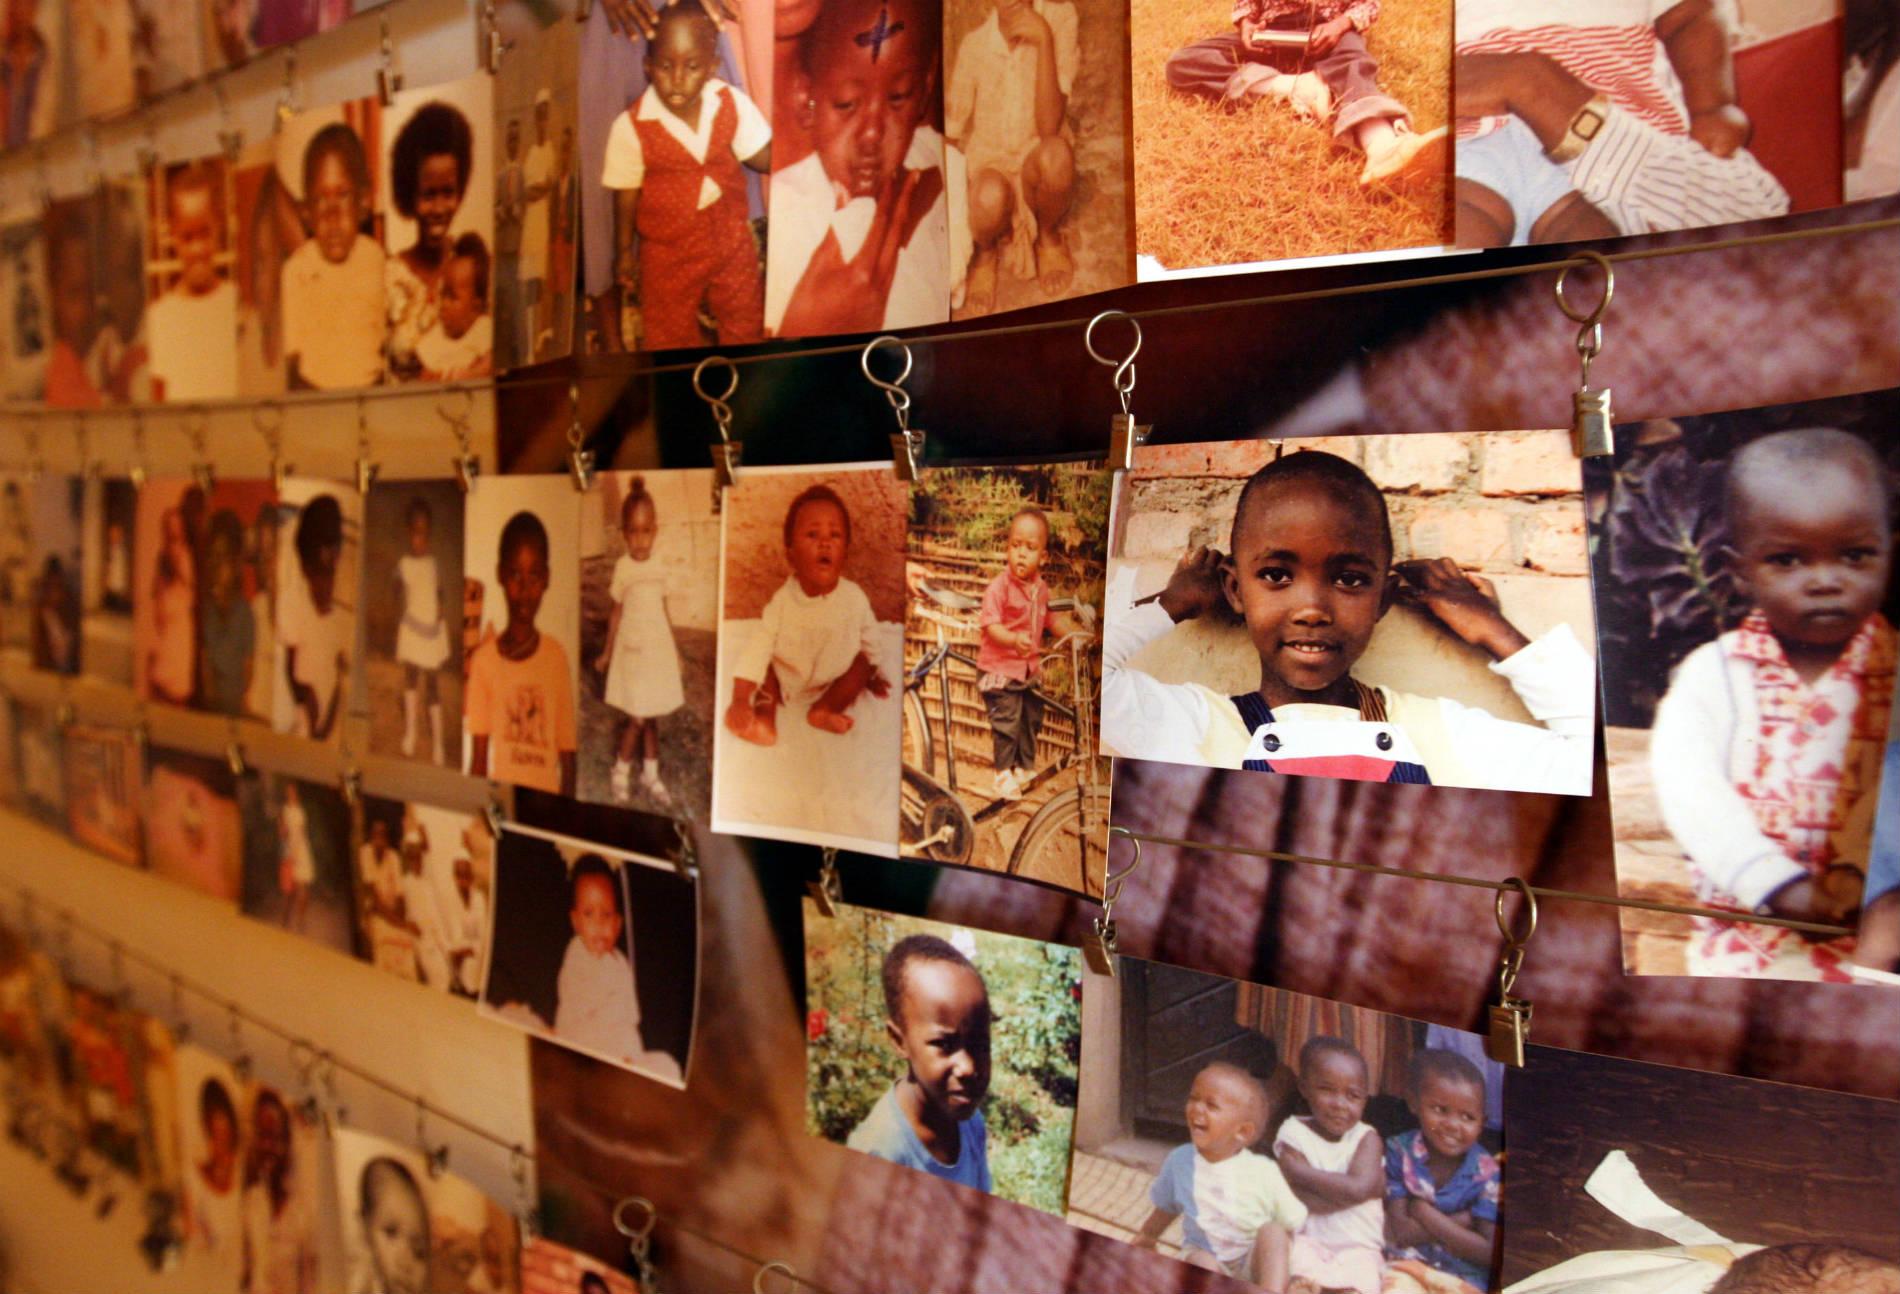 Rwanda: 15 years on, DFID